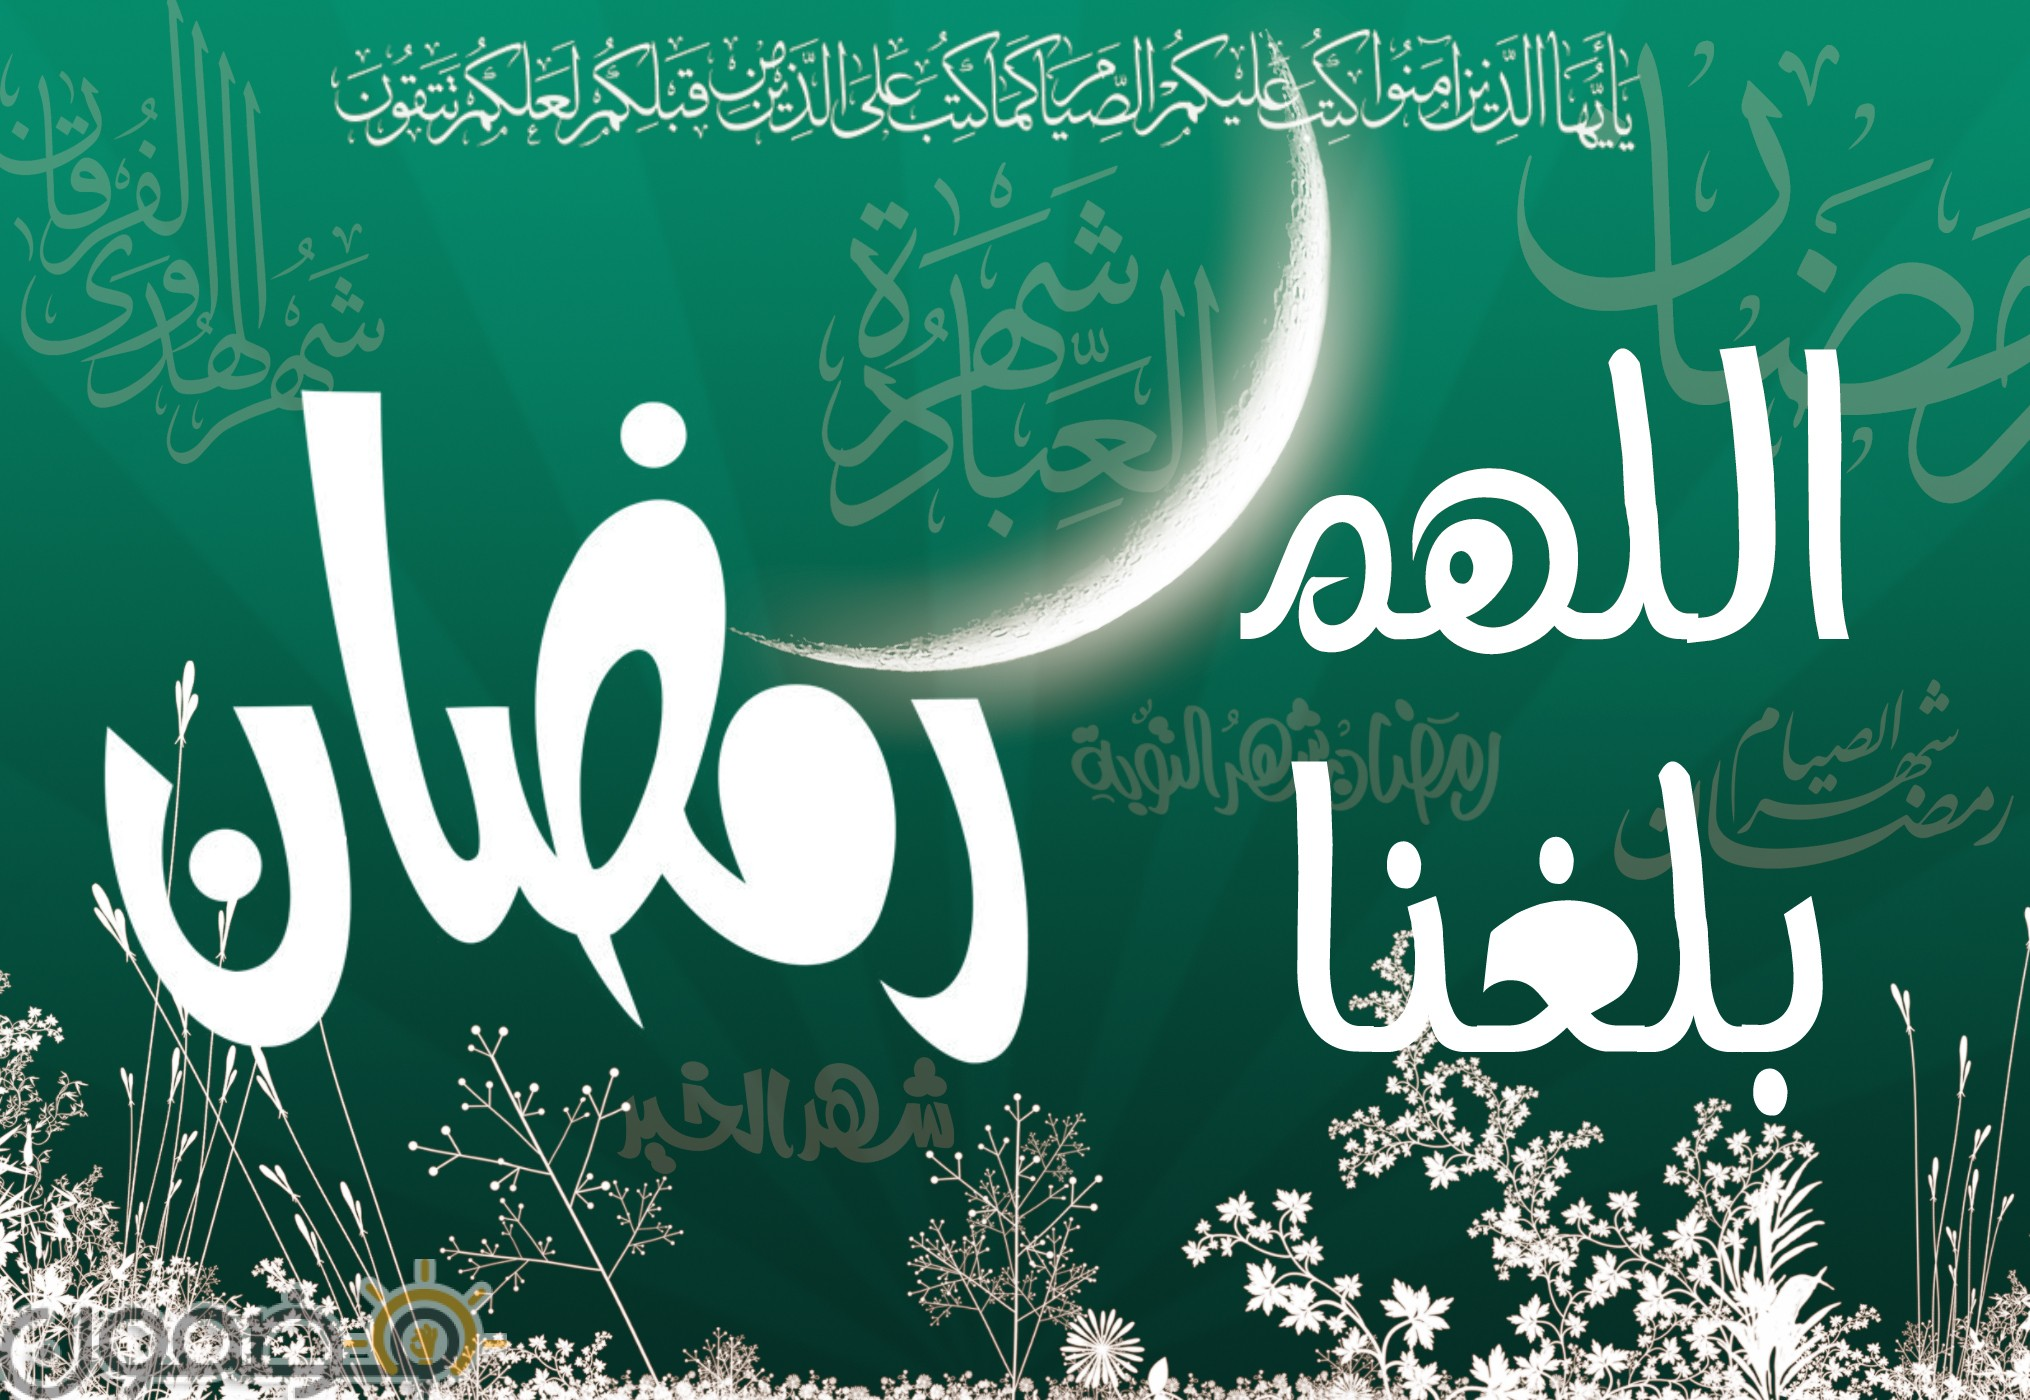 صور اللهم بلغنا رمضان 5 صور اللهم بلغنا رمضان مع ارق العبارات